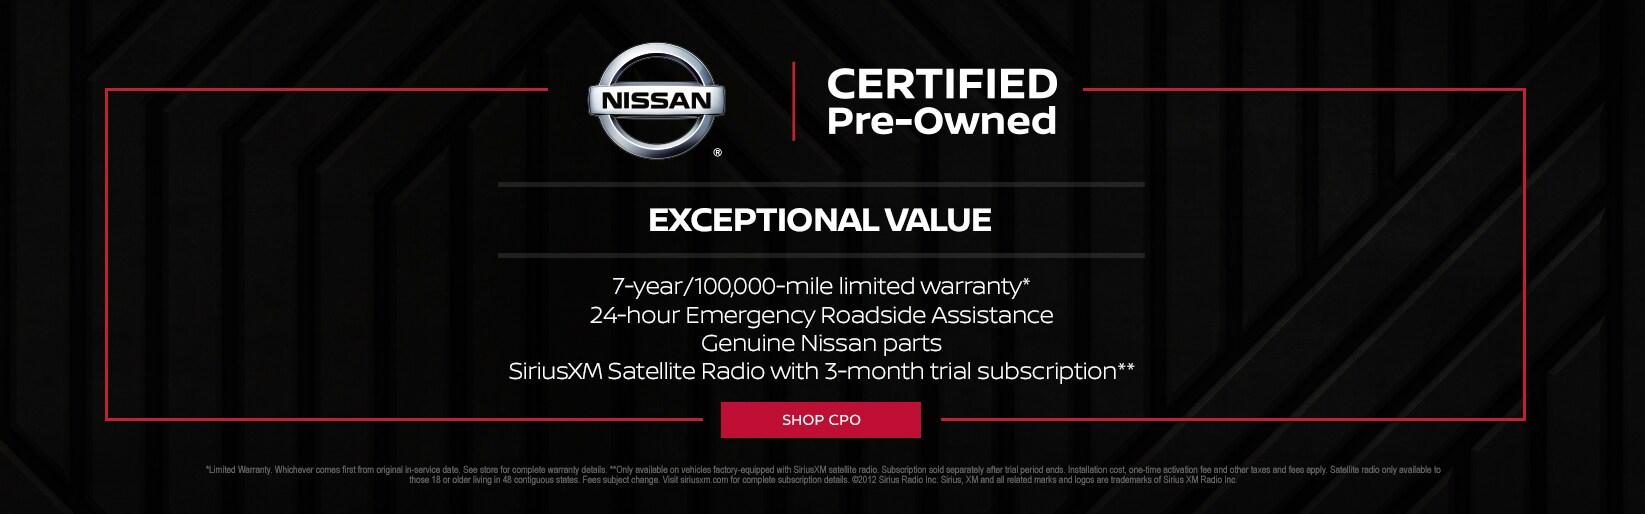 Nissan Dealership Near Me In Miami | AutoNation Nissan Miami